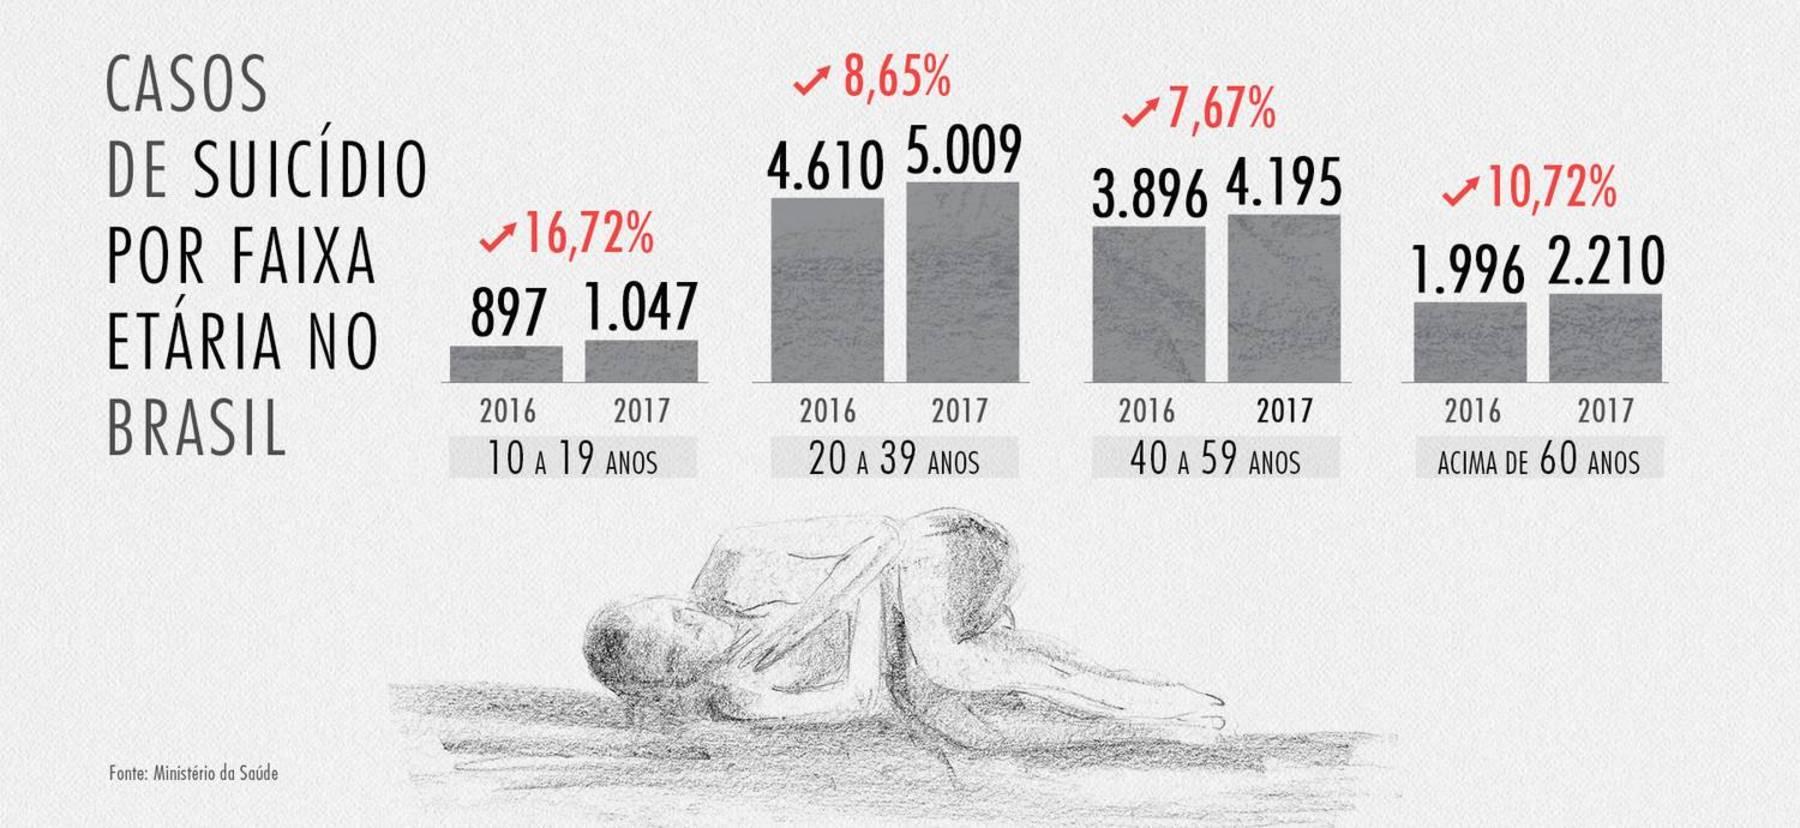 https://img.r7.com/images/suicidio-no-brasil-09092019111707588